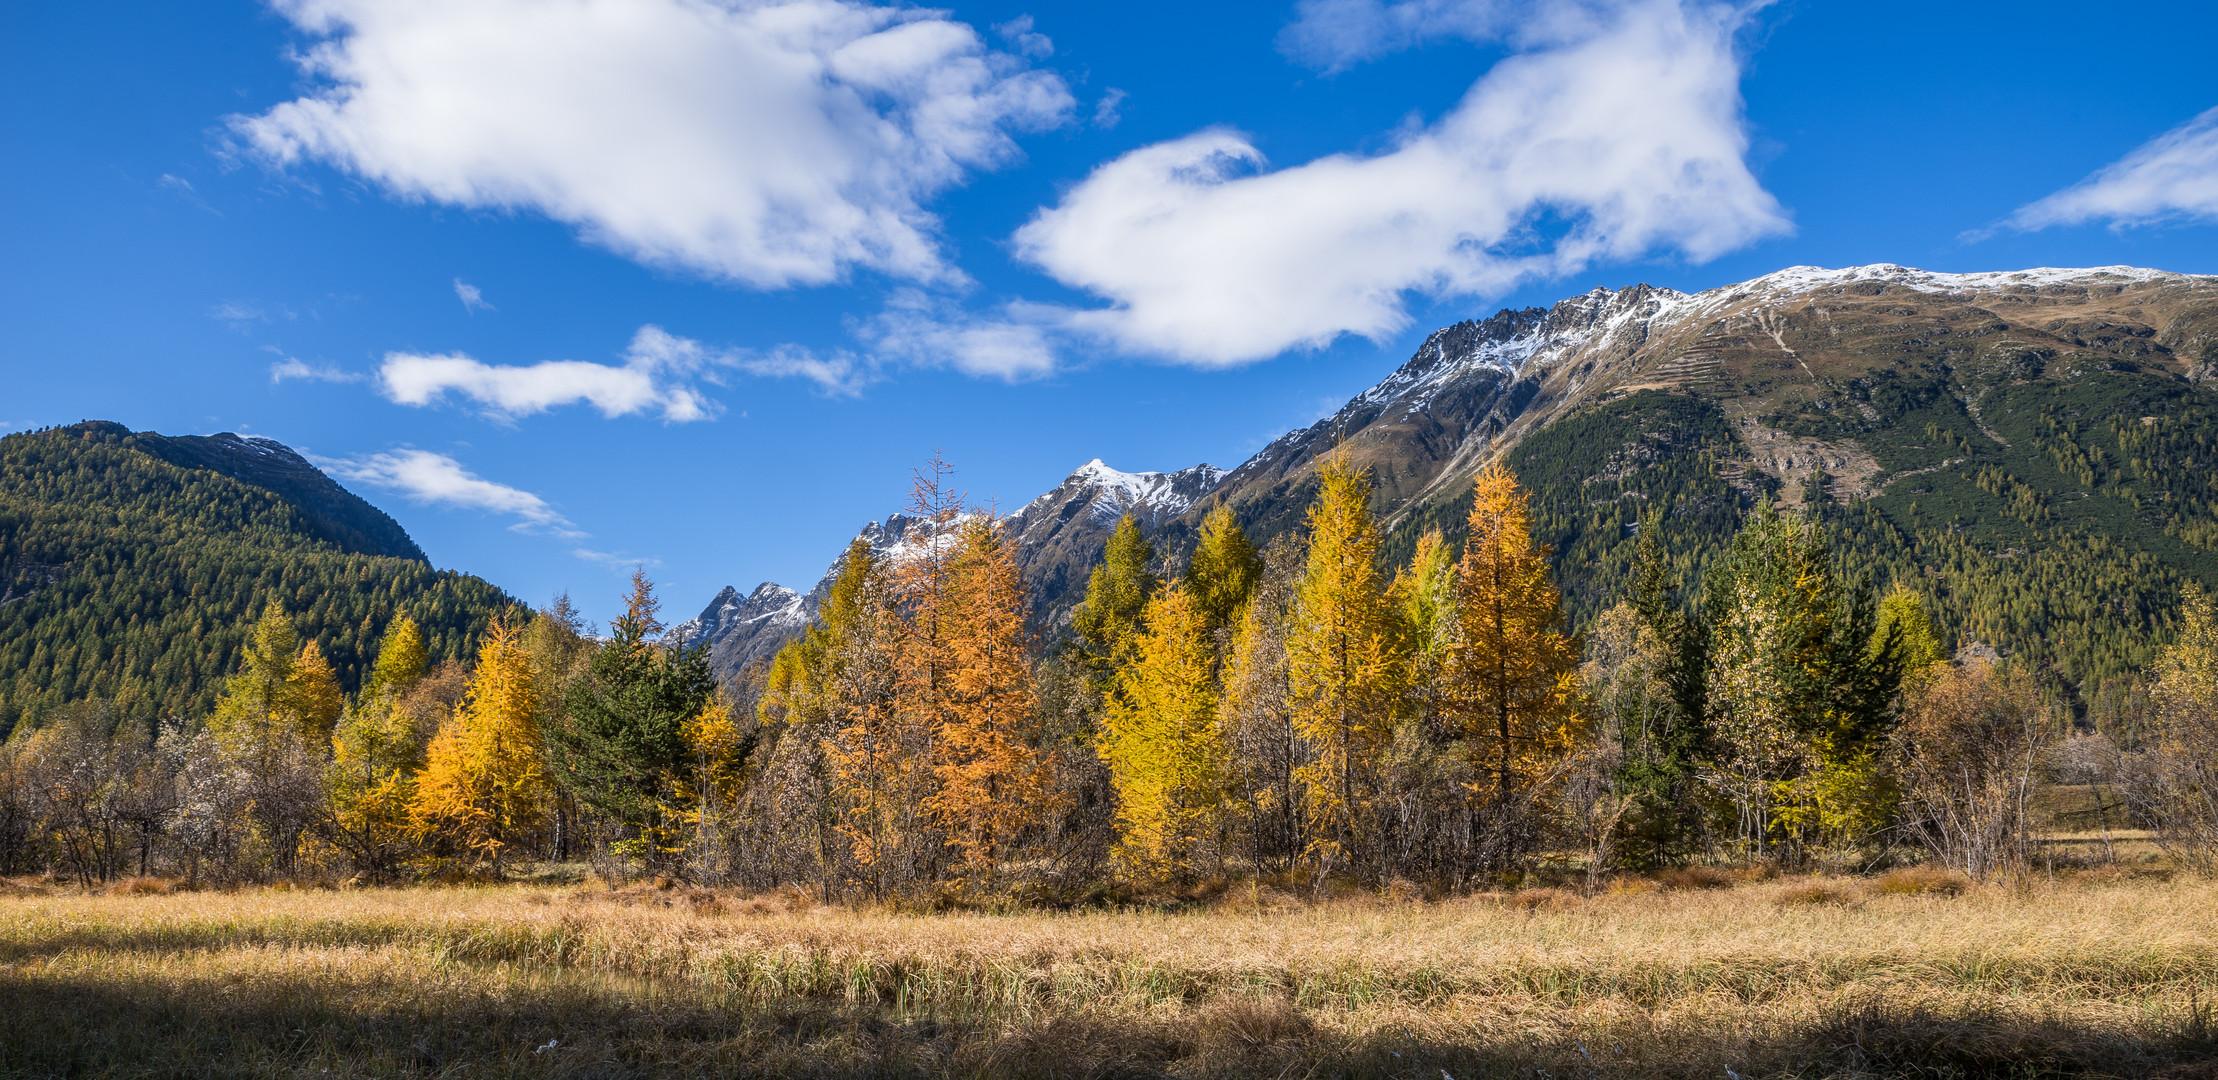 Letztes Herbstbild